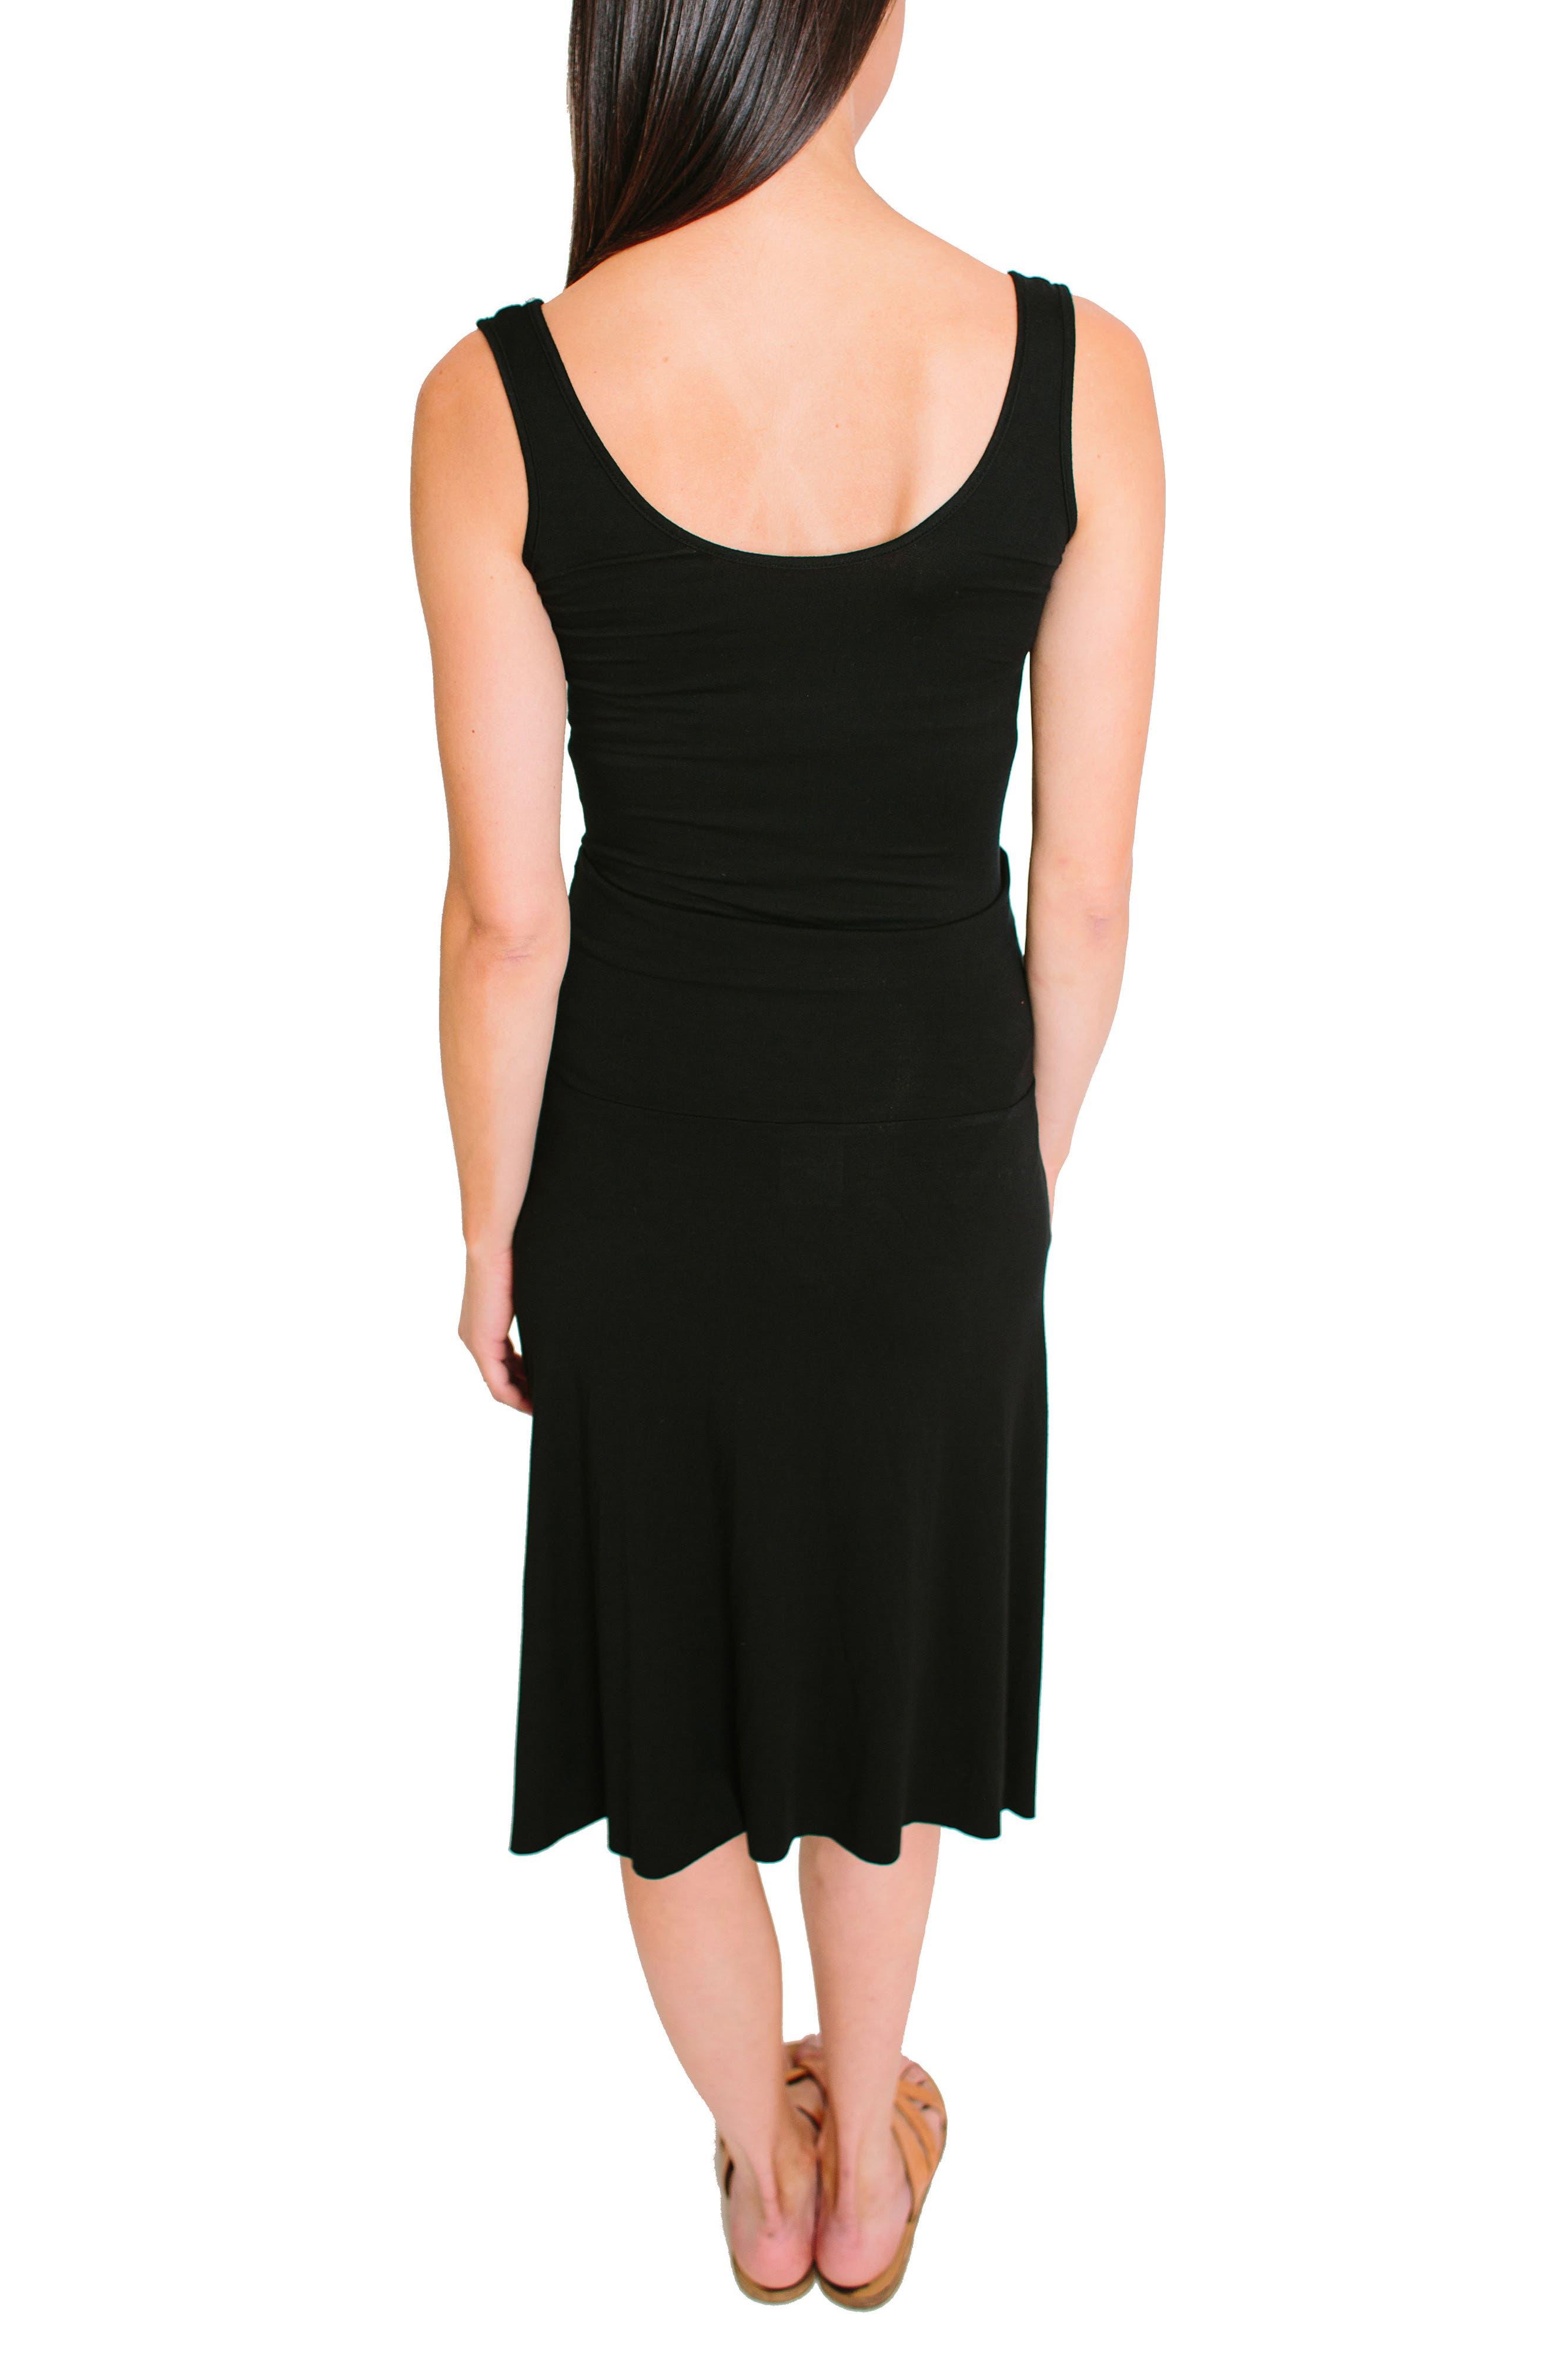 NOM Nola Maternity Skirt,                             Alternate thumbnail 2, color,                             BLACK